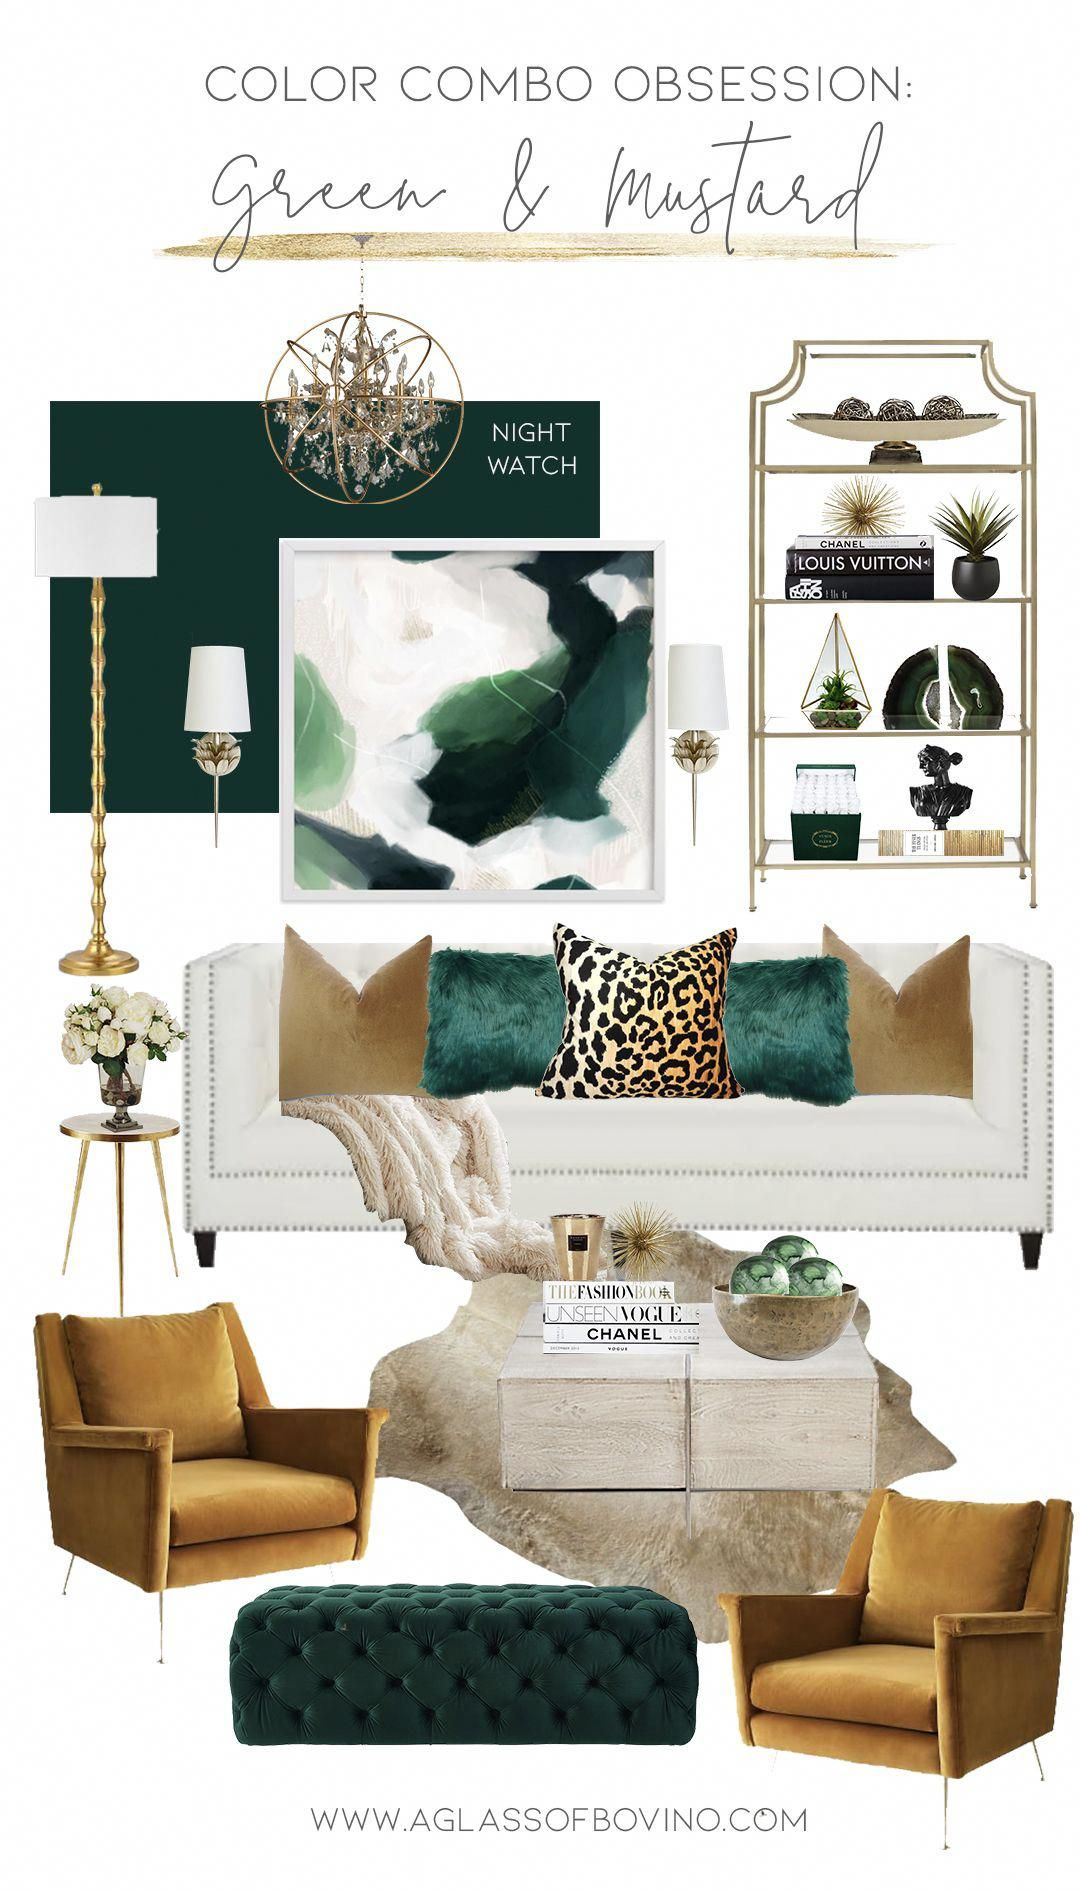 Offbeat Red Furniture Living Room Hometown Homefurniturefloors